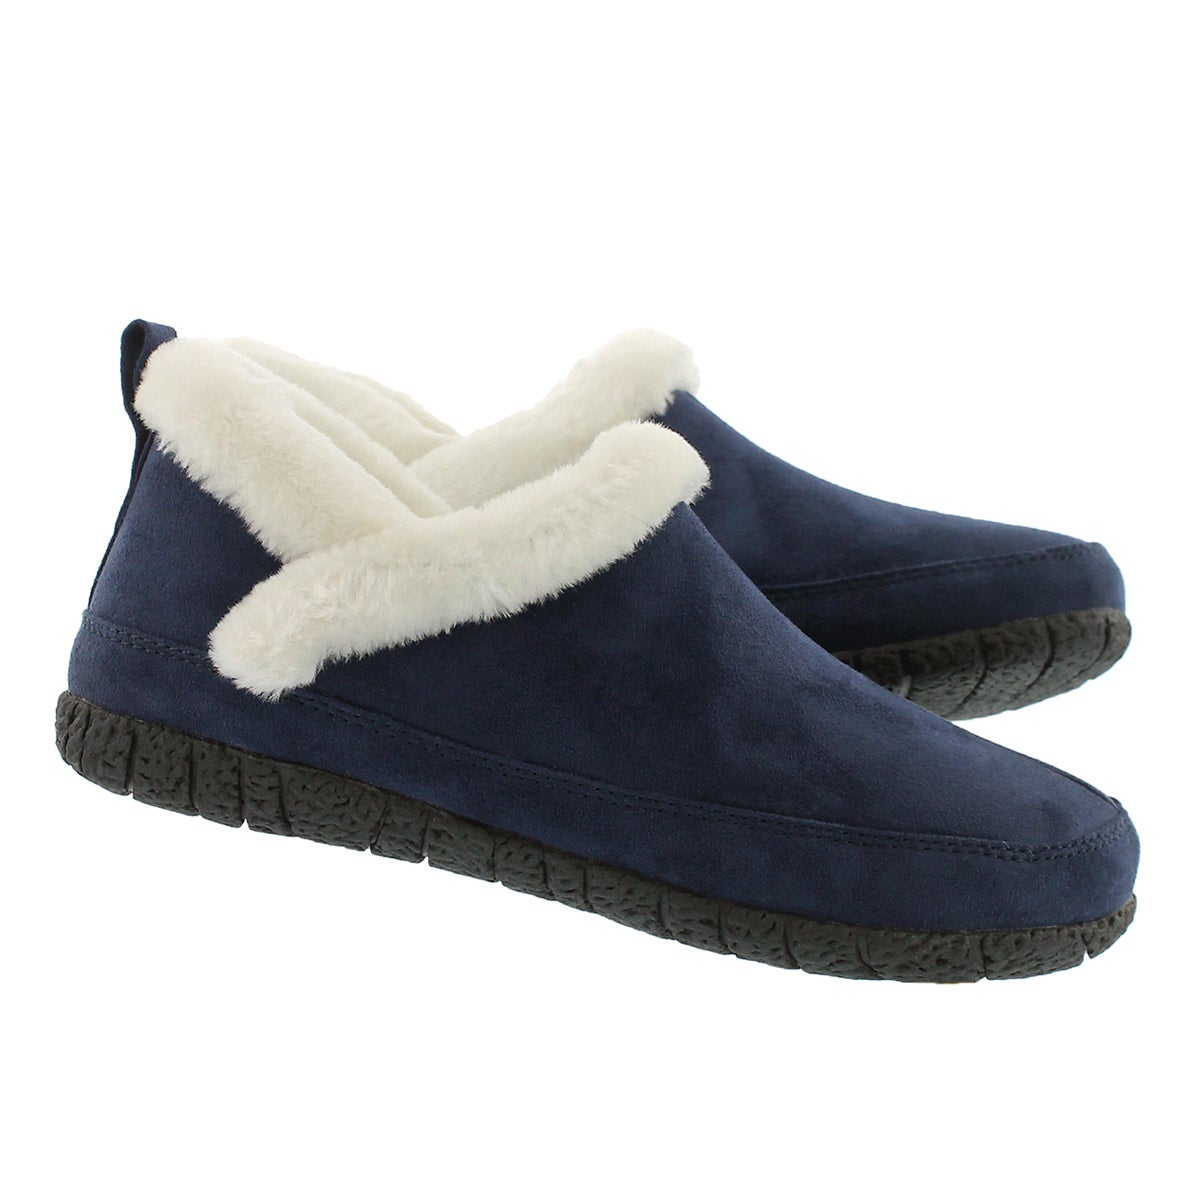 Lds Ruby 2 navy closed back slipper